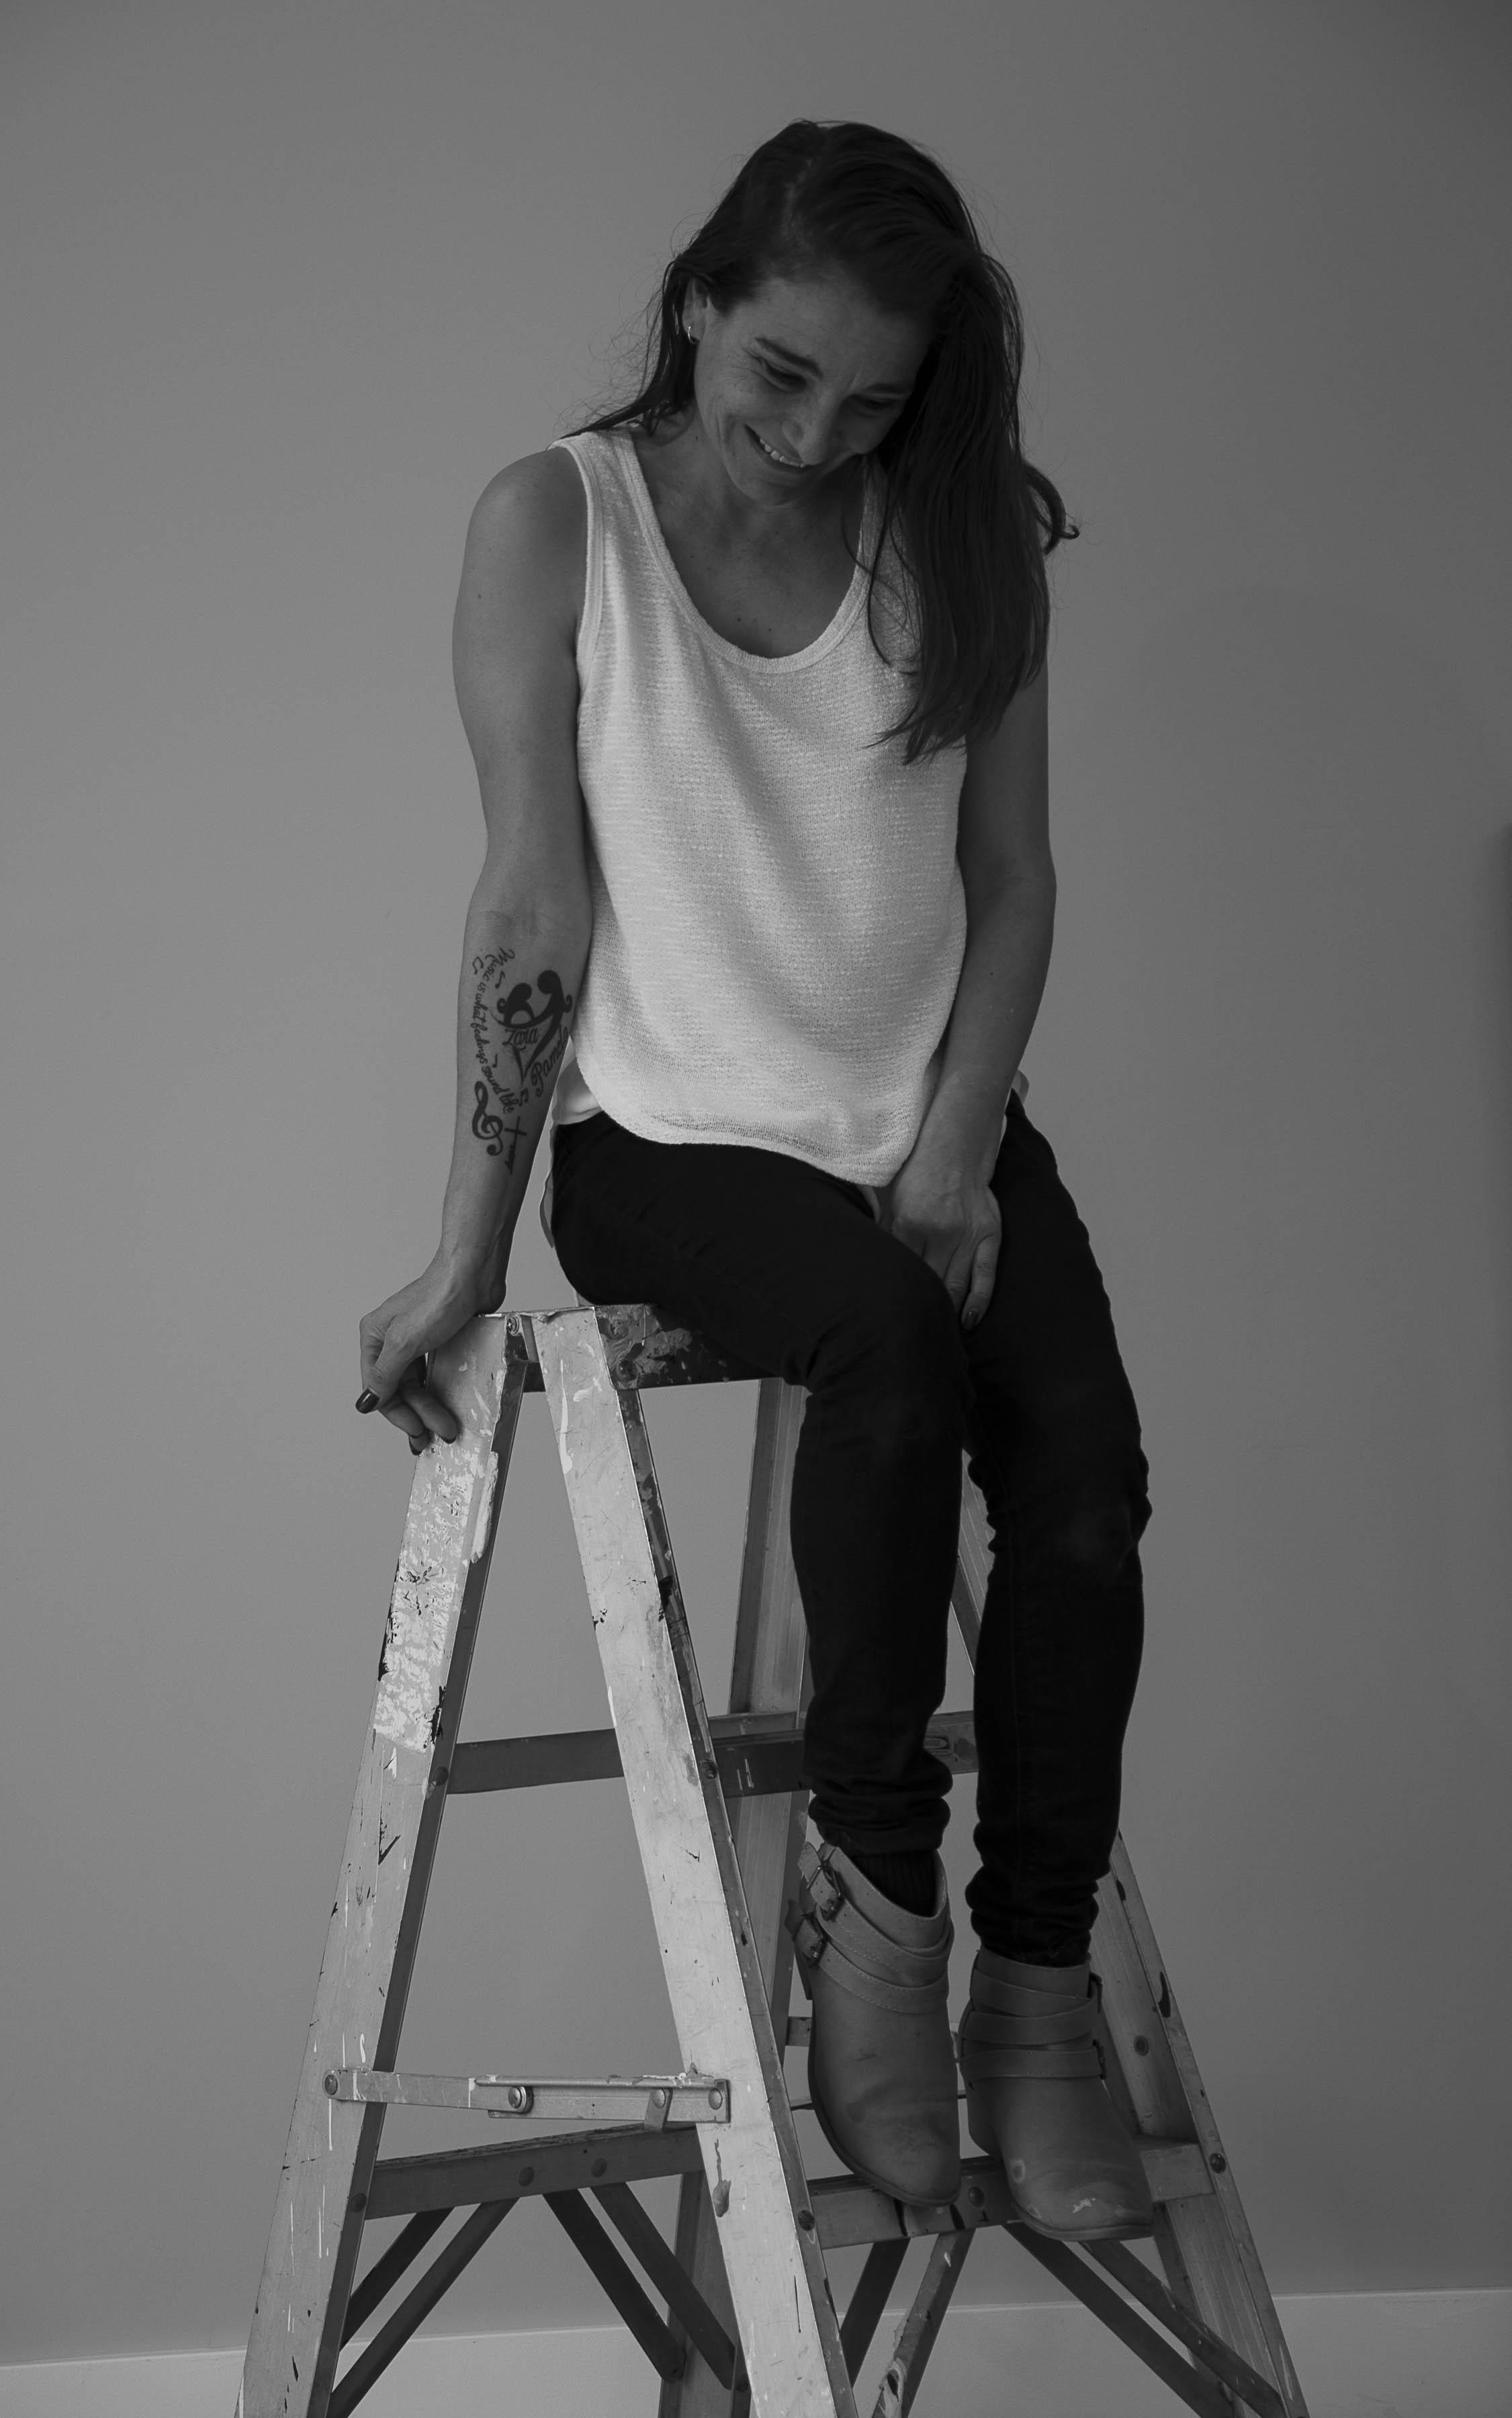 Photographer: Kristen Latimer (self portrait)